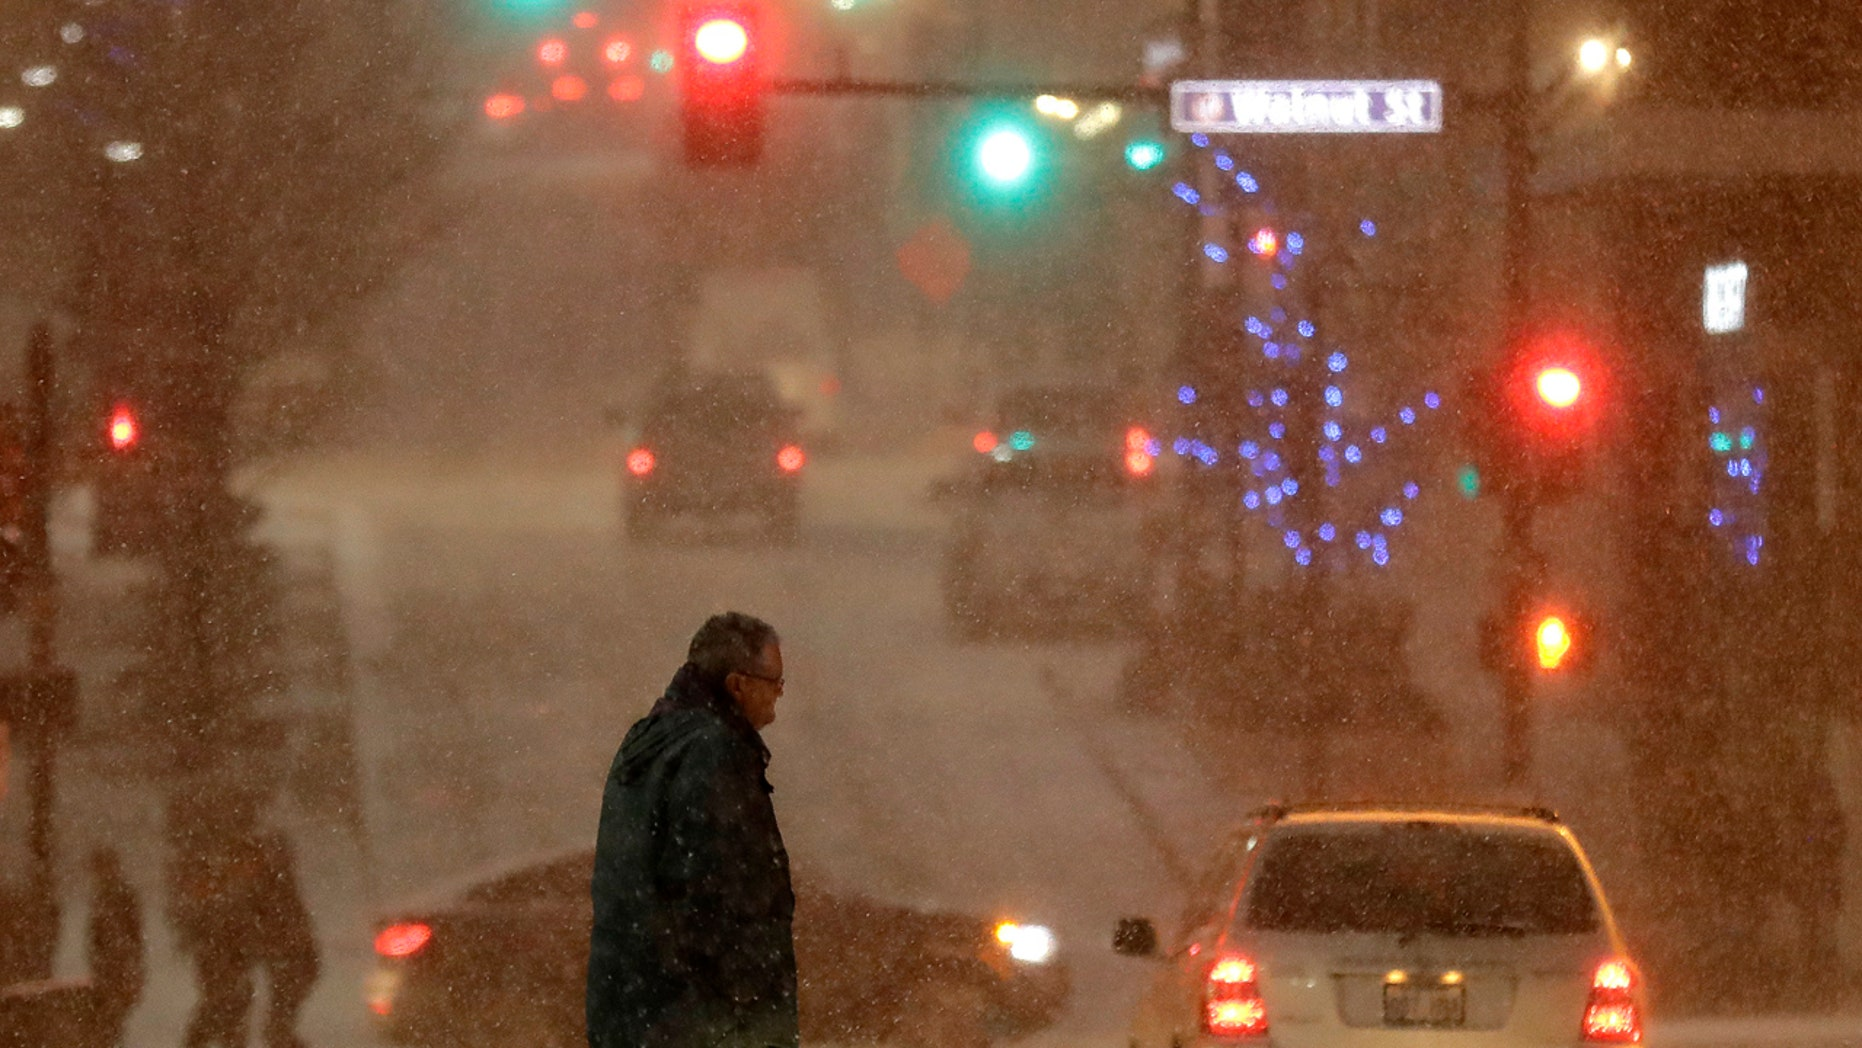 A pedestrian walks across a street in downtown Kansas City, Mo., on Saturday, Dec. 17, 2016.